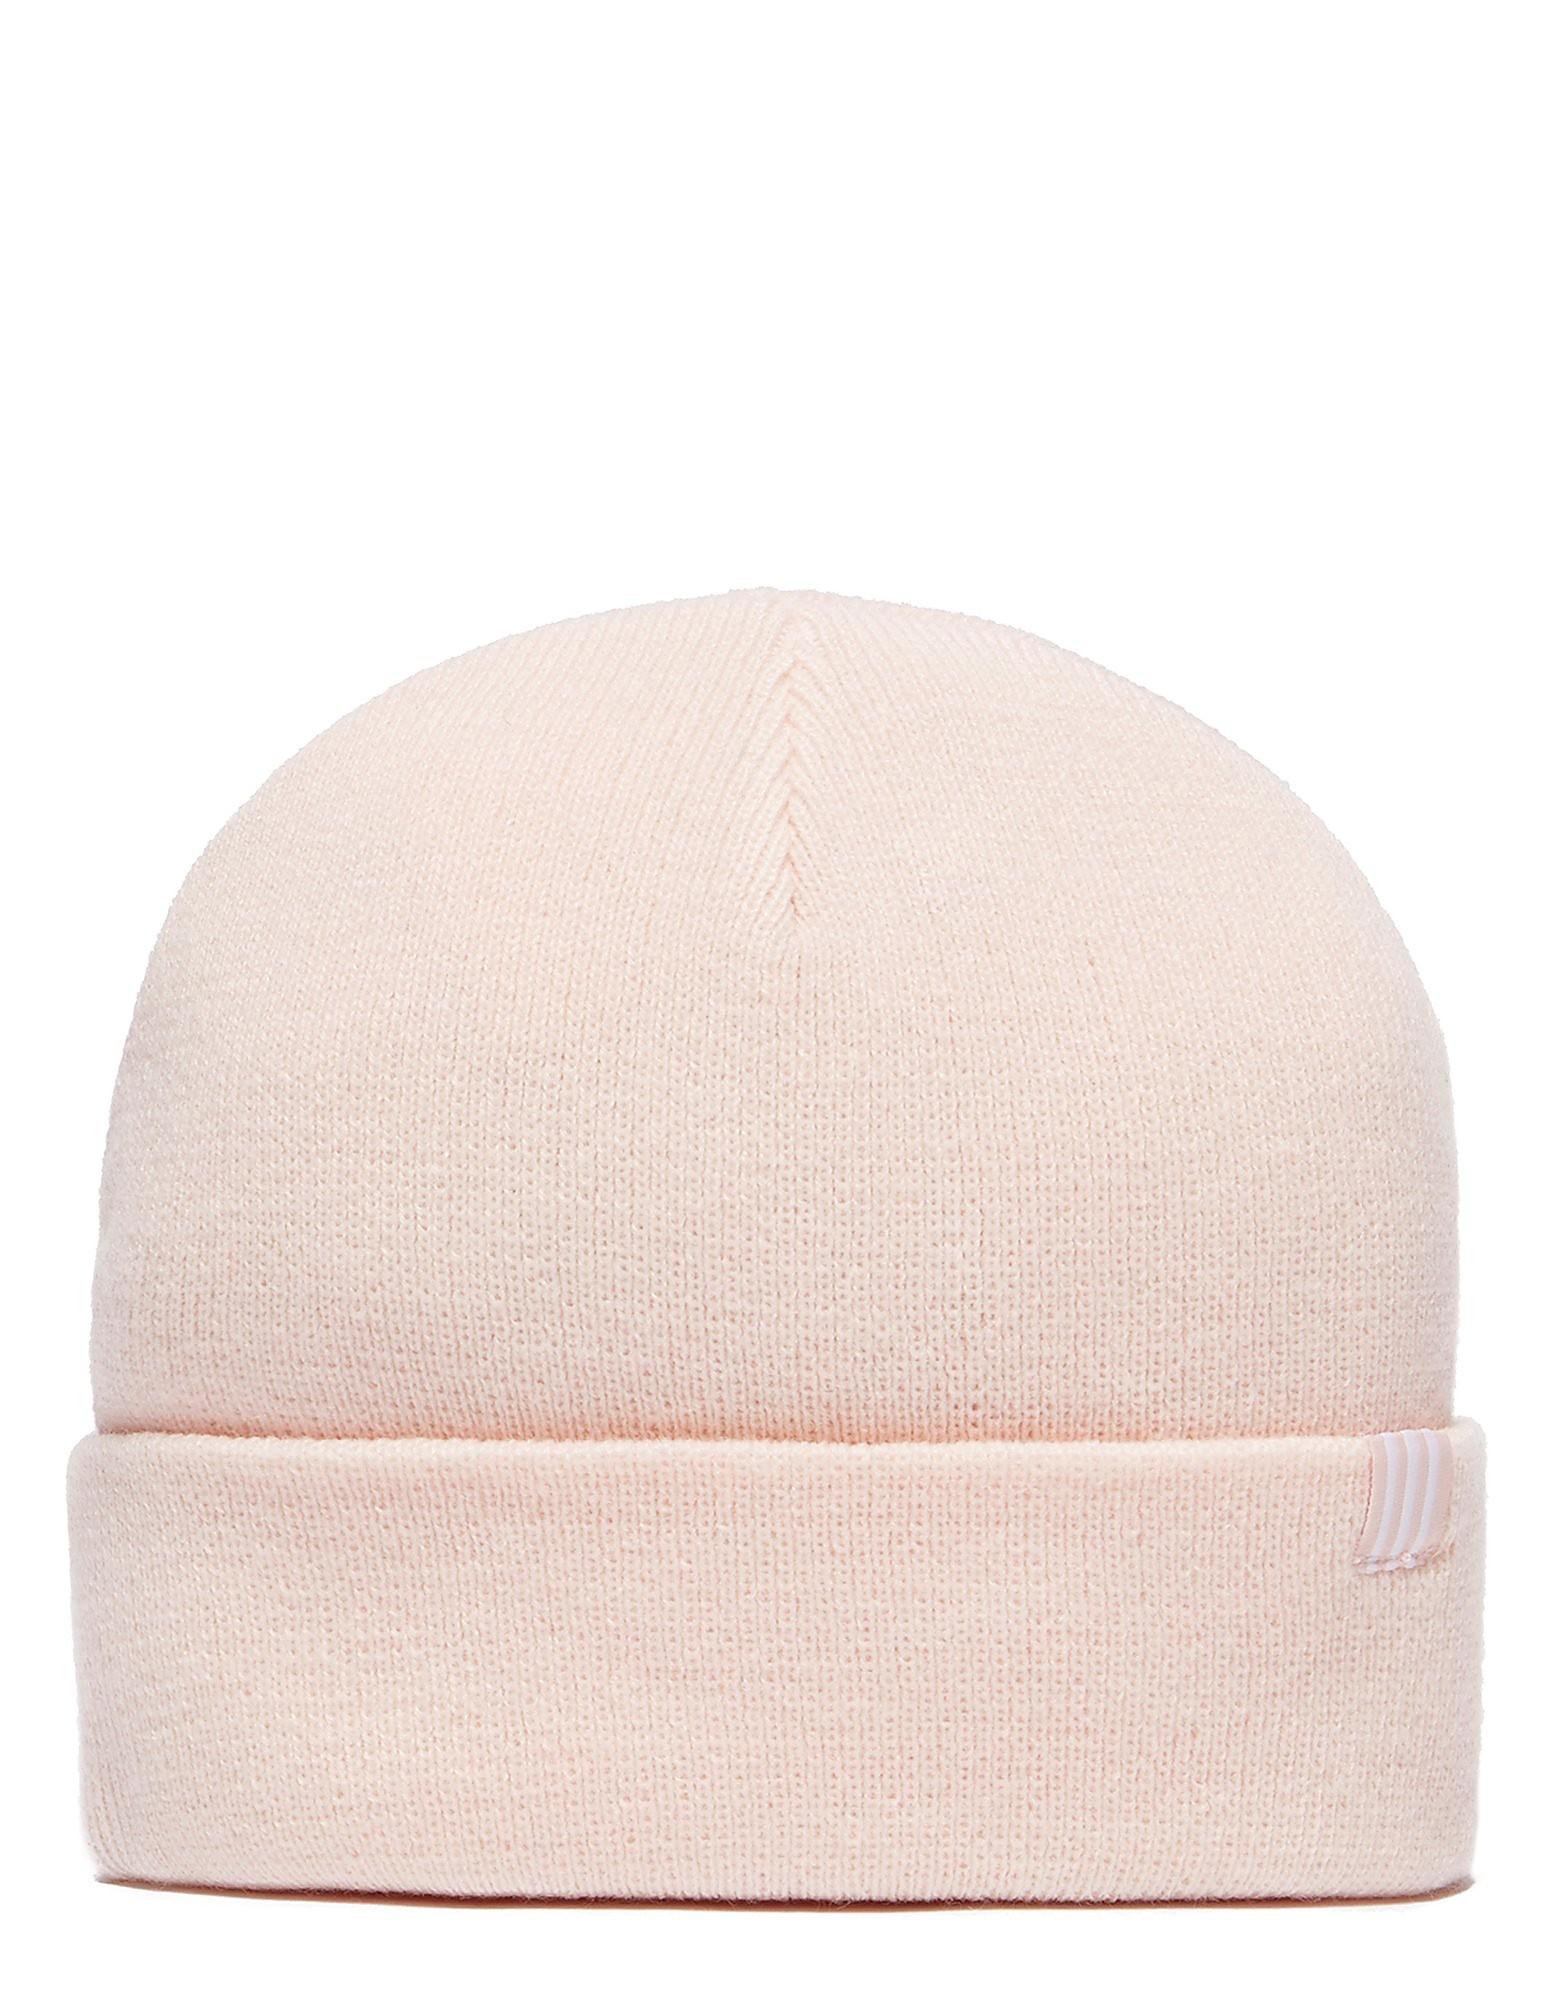 adidas Originals Trefoil Beanie Hat